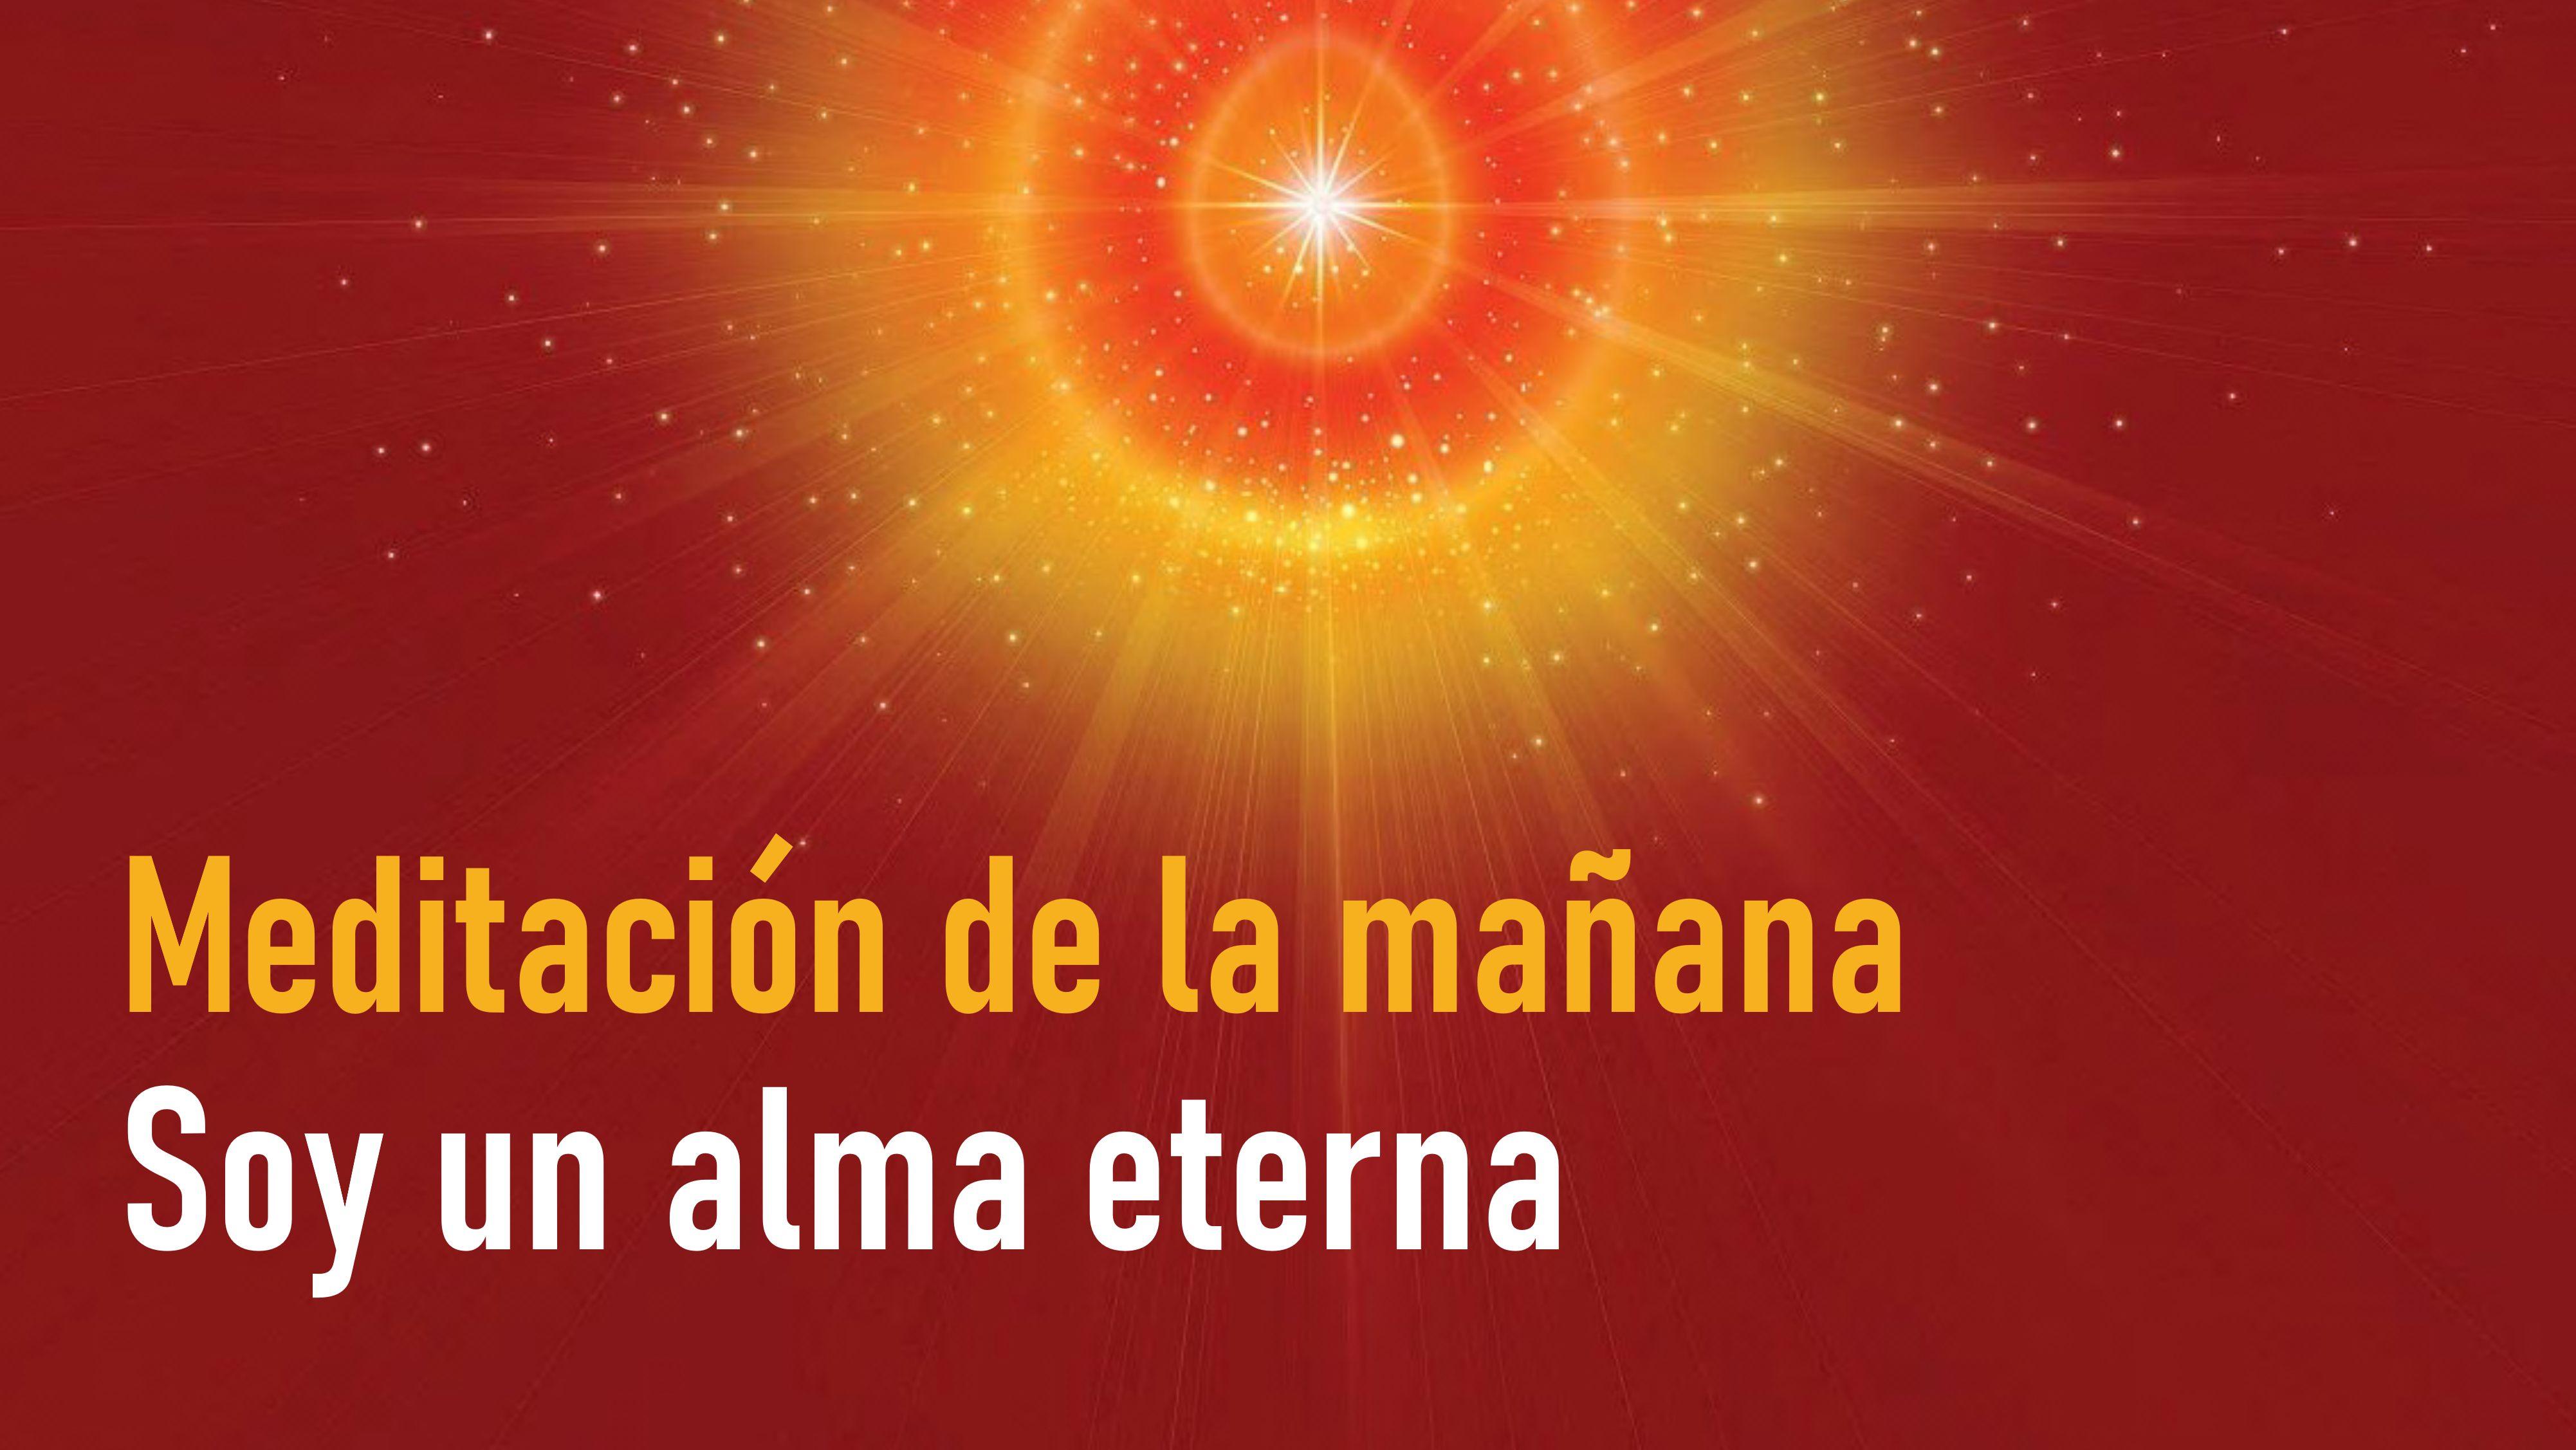 Meditación de la mañana Raja Yoga: Soy un alma eterna (13 Octubre 2020)